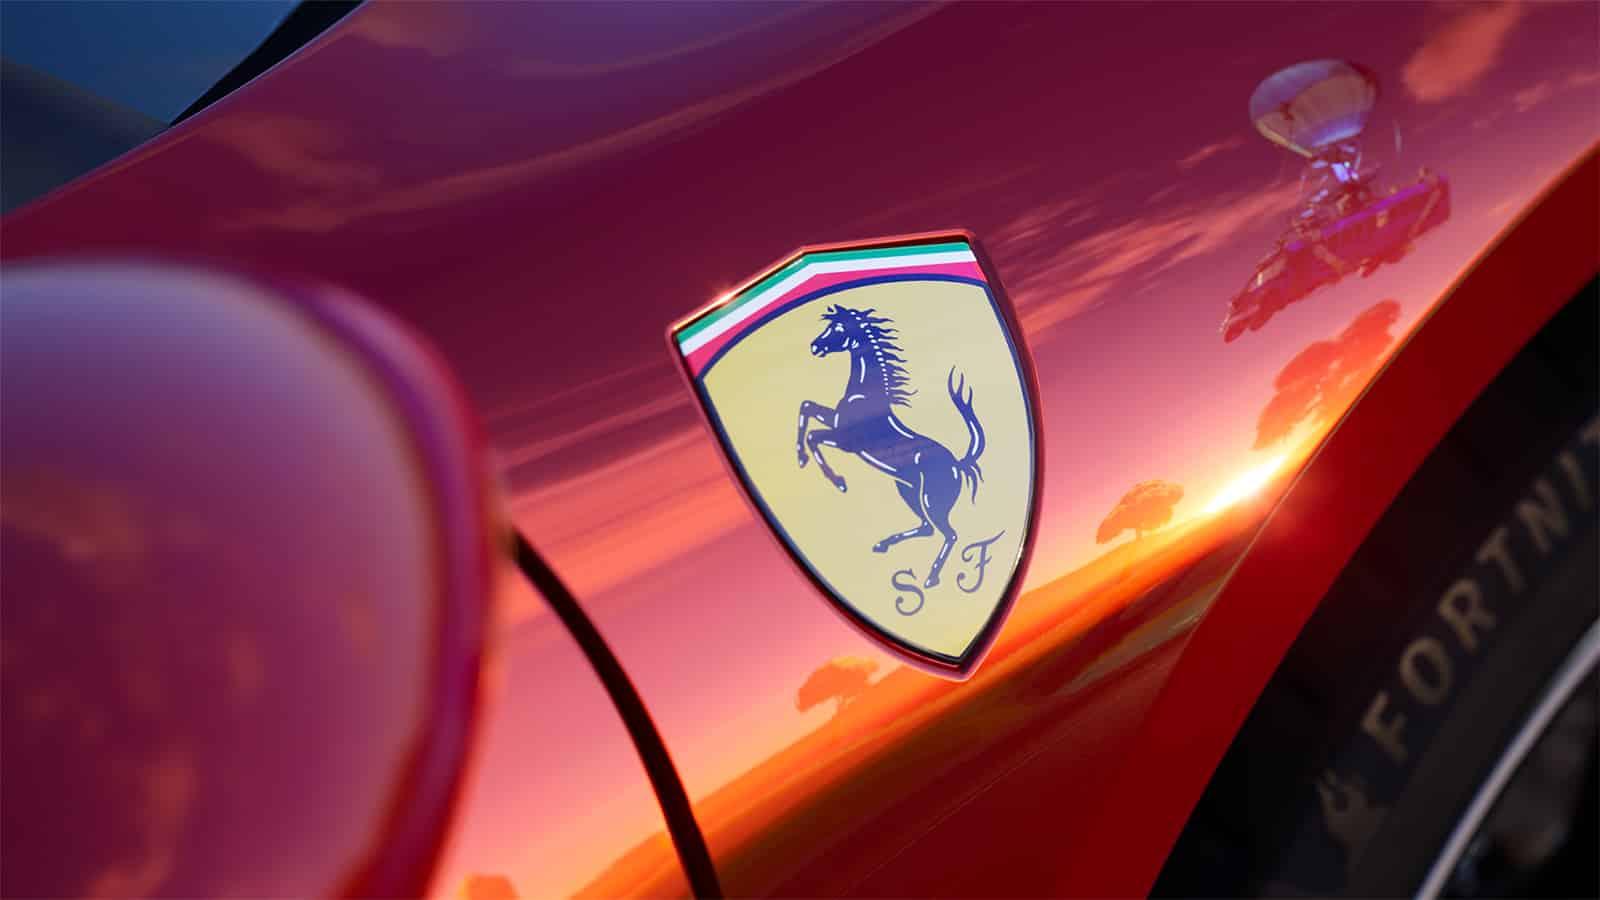 Ferrari de Fortnite